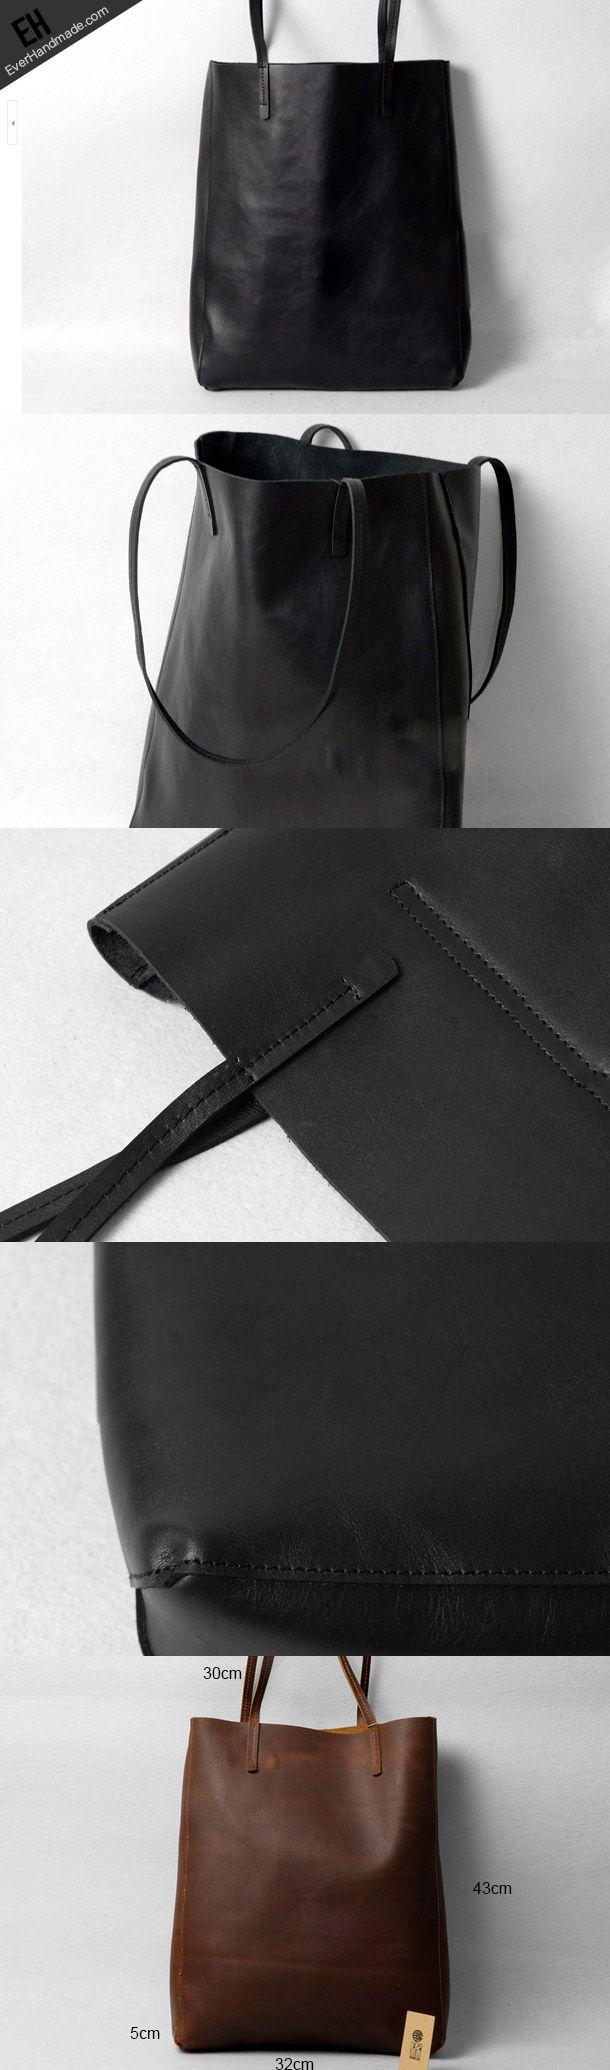 Una así pero que no sea de piel - cheap designer crossbody bags, shopping bag, white fringe bag *sponsored https://www.pinterest.com/bags_bag/ https://www.pinterest.com/explore/bag/ https://www.pinterest.com/bags_bag/weekend-bag/ https://www.jackthreads.com/accessories/bags/315